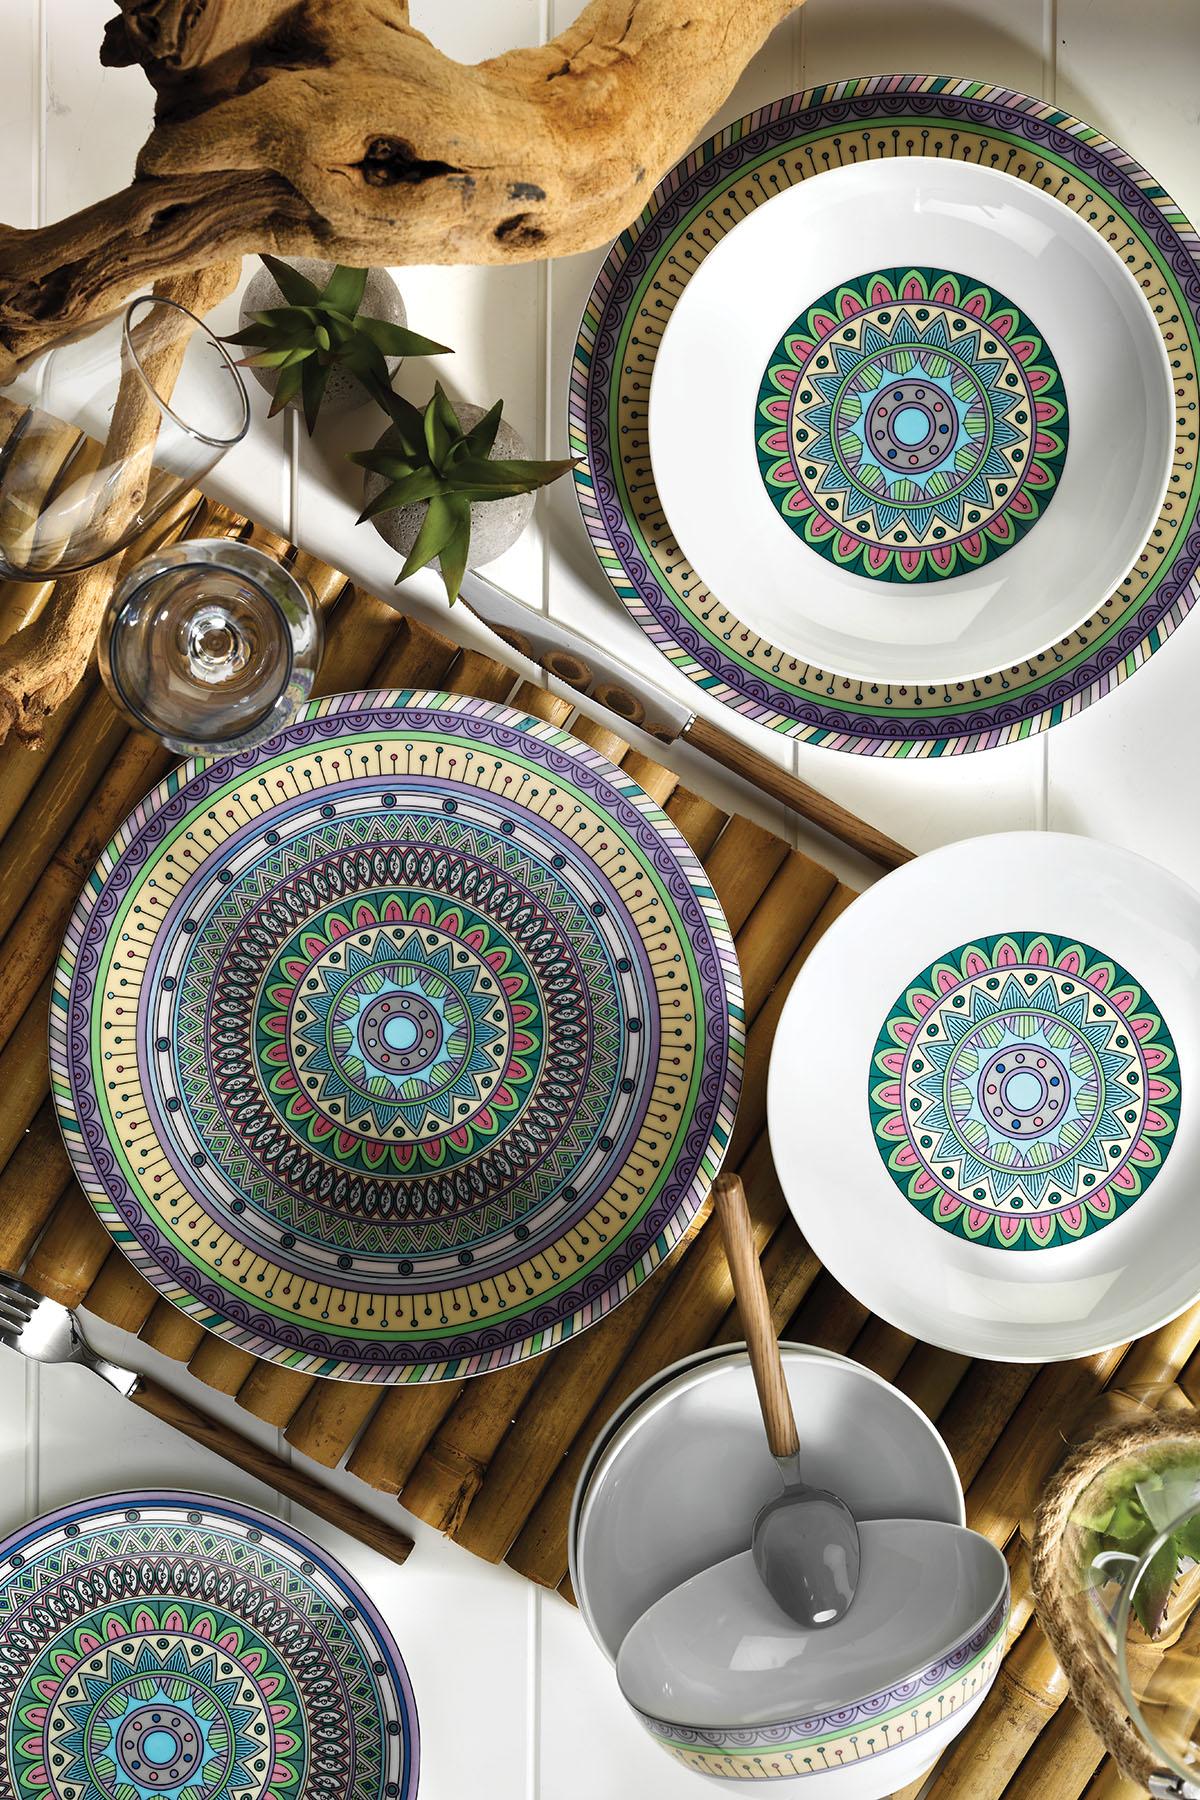 KÜTAHYA PORSELEN - Kütahya Porselen 9996 Desen 24 Parça Yemek Seti